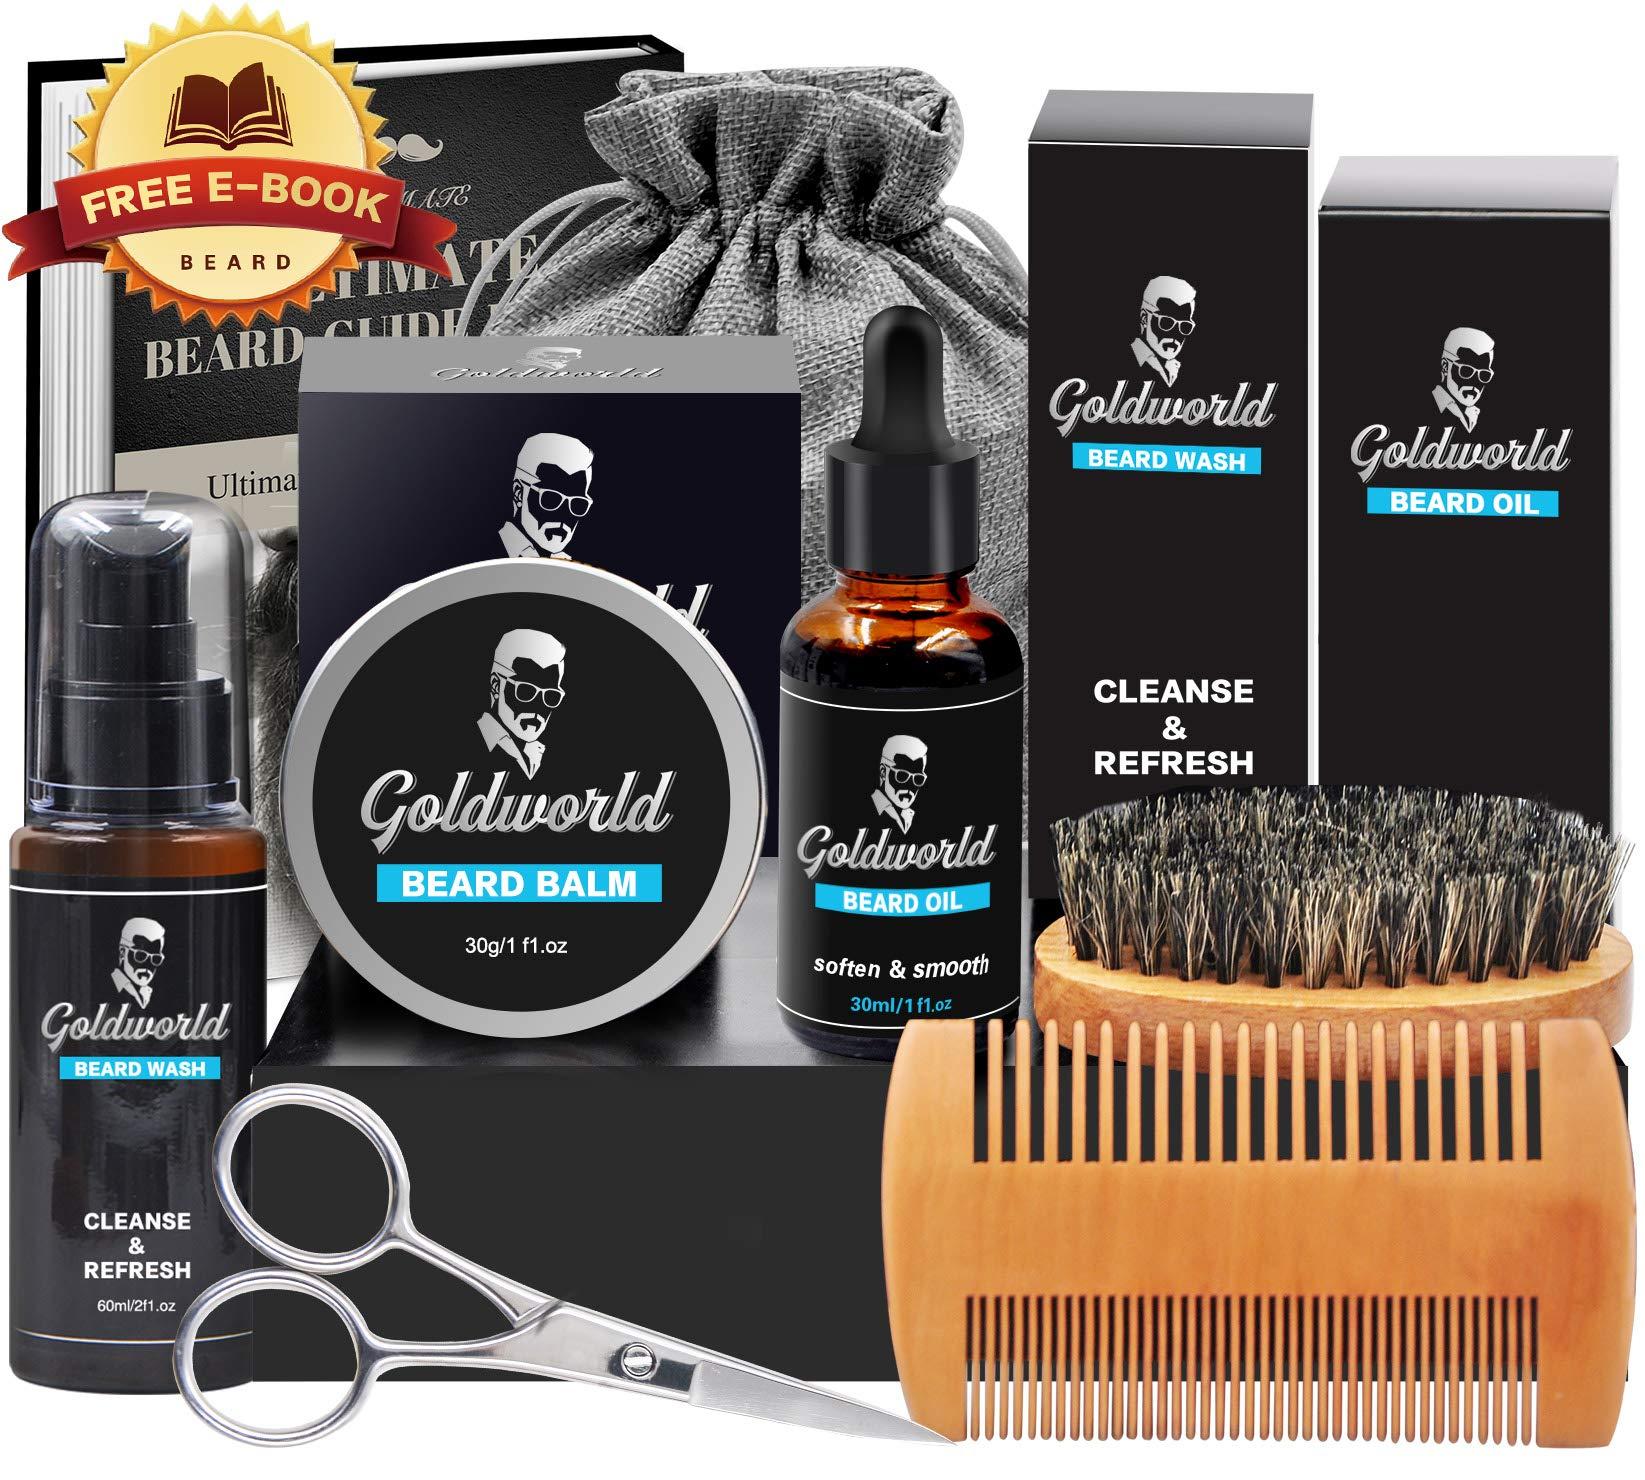 Beard Care & Grooming Kit w/Free Beard Wash/Shampoo, w